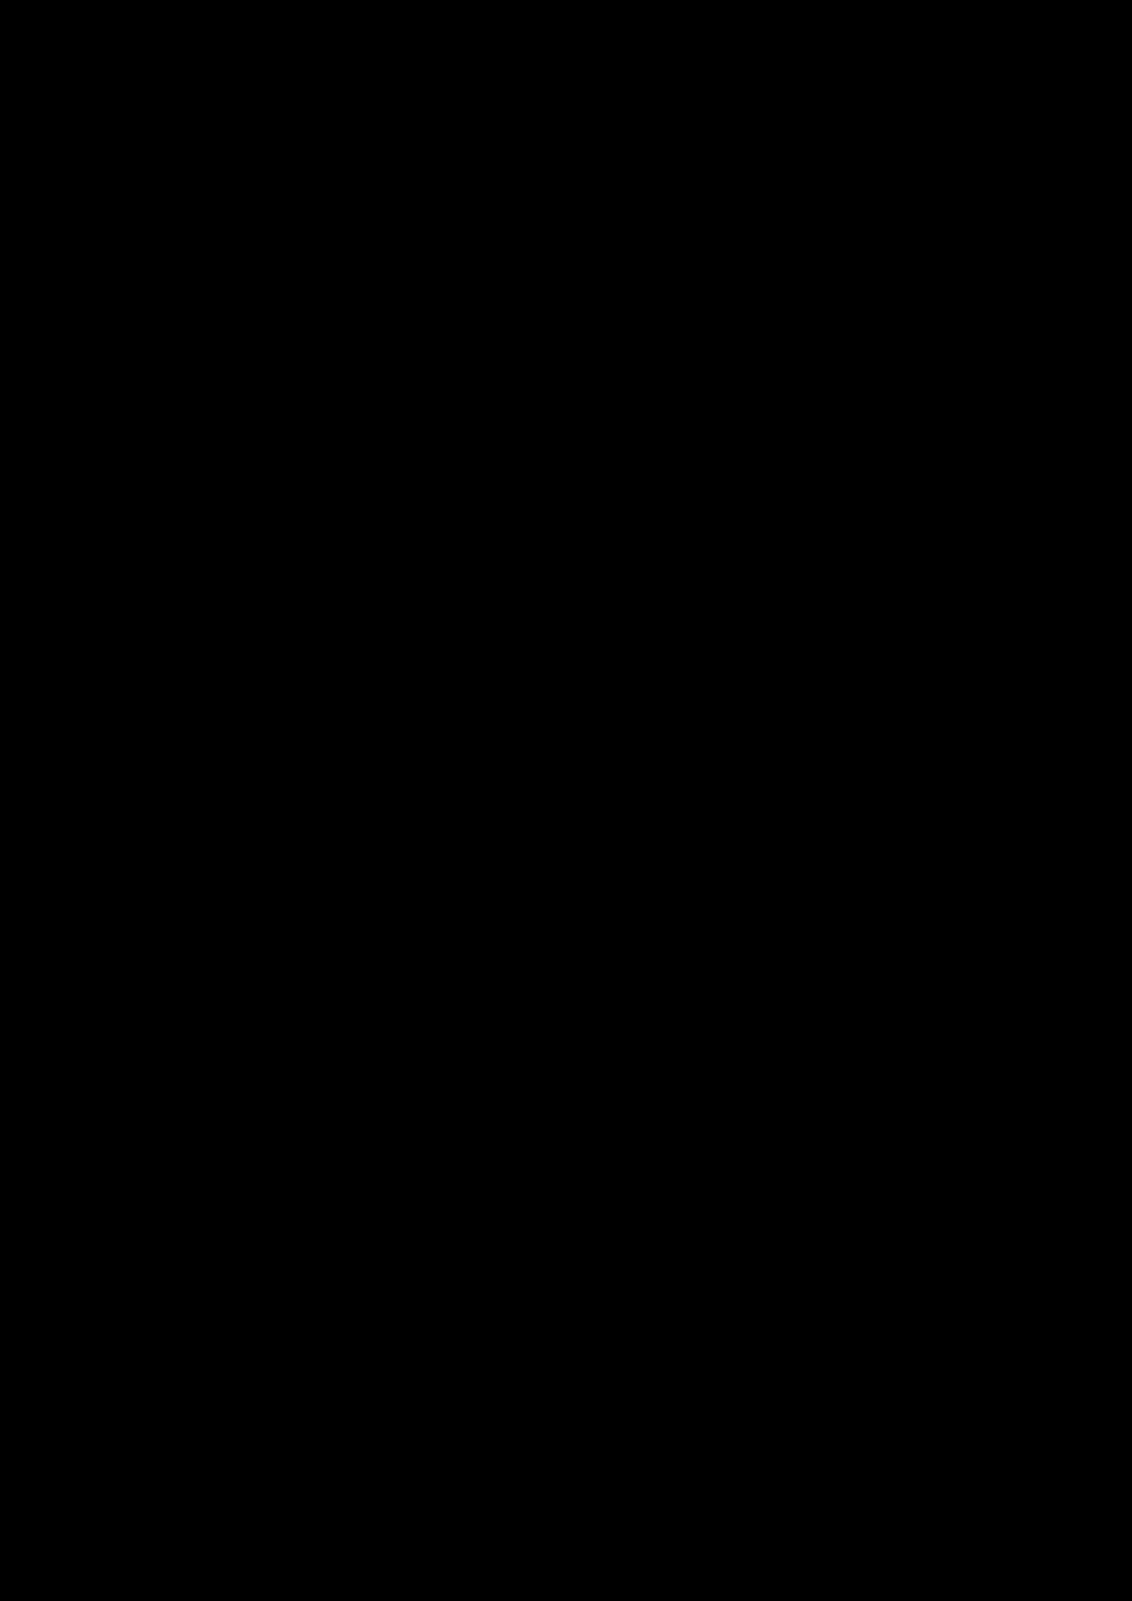 CHujina slide, Image 3